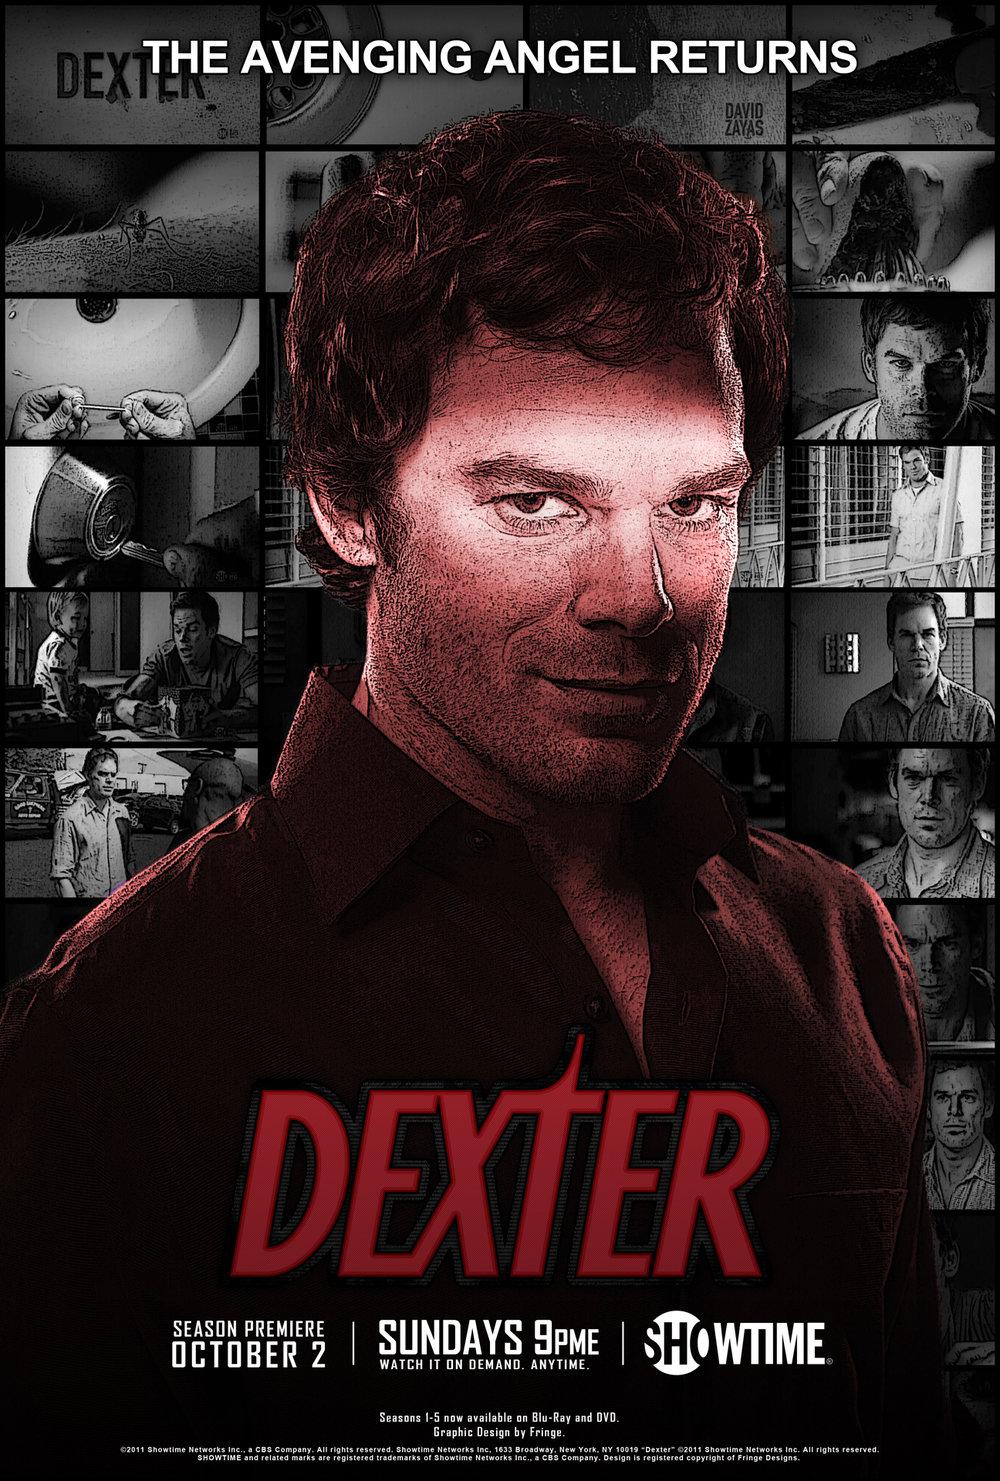 dexter_1296x1920_by_fringegraphics-d4cxd4c.jpg